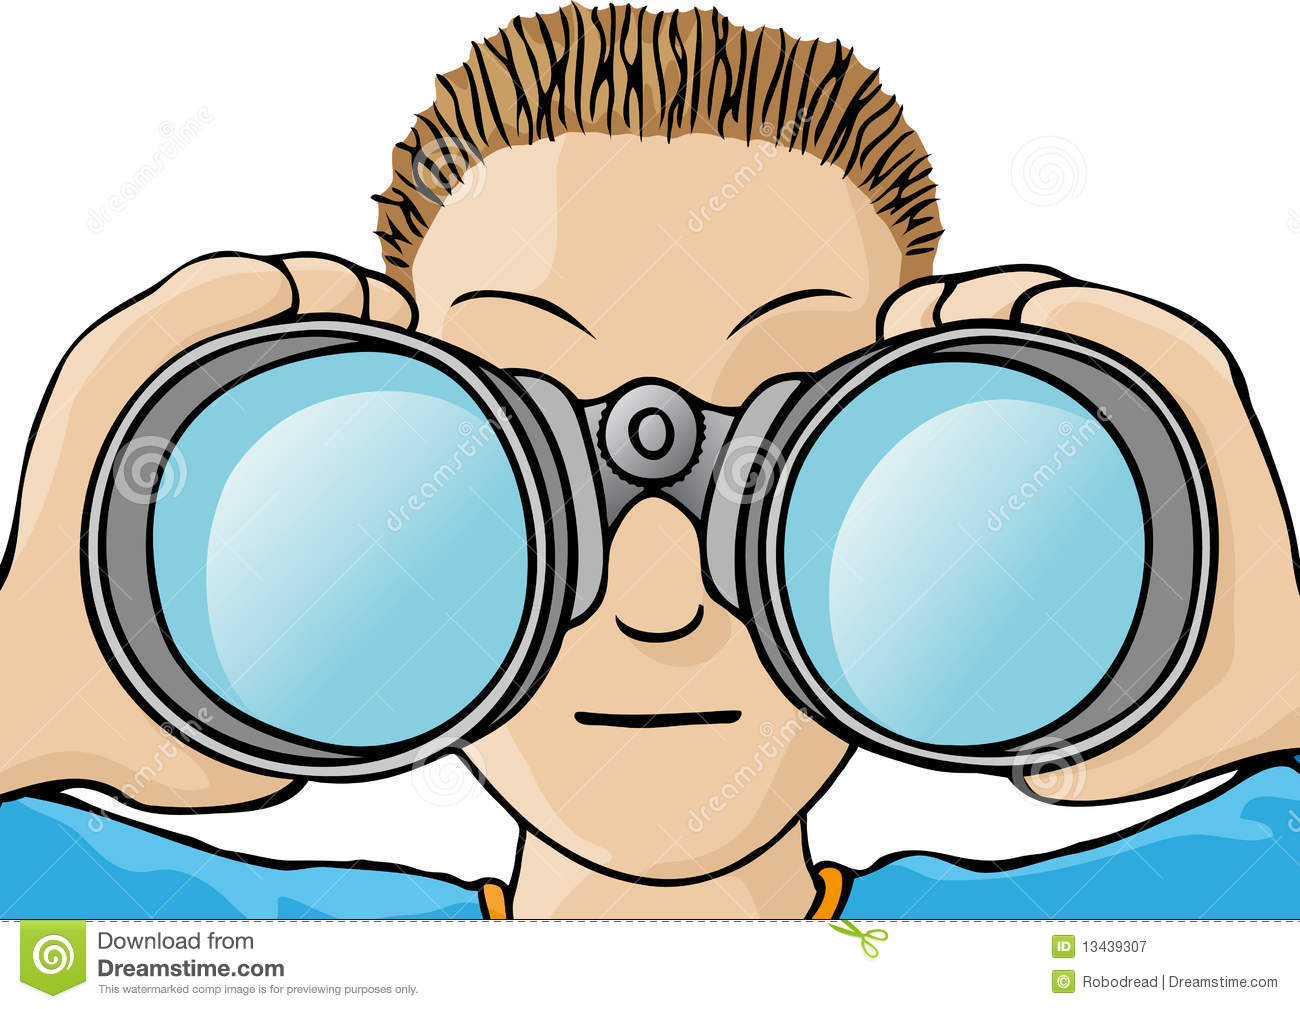 Kids with binoculars clipart.